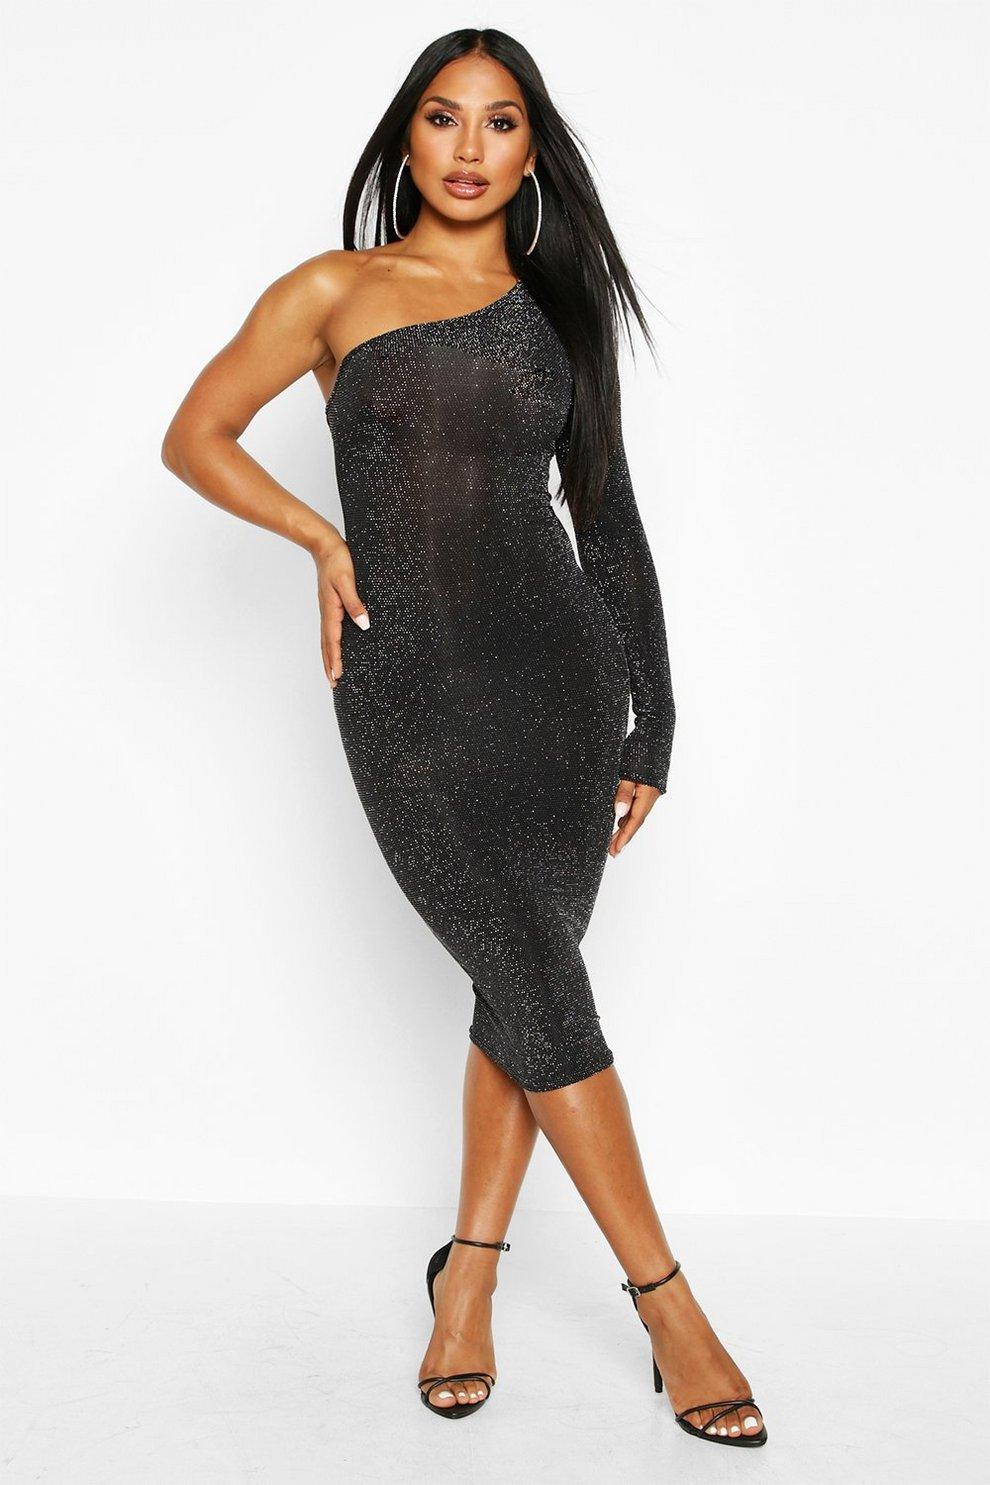 One little shoulder black dress rare photo